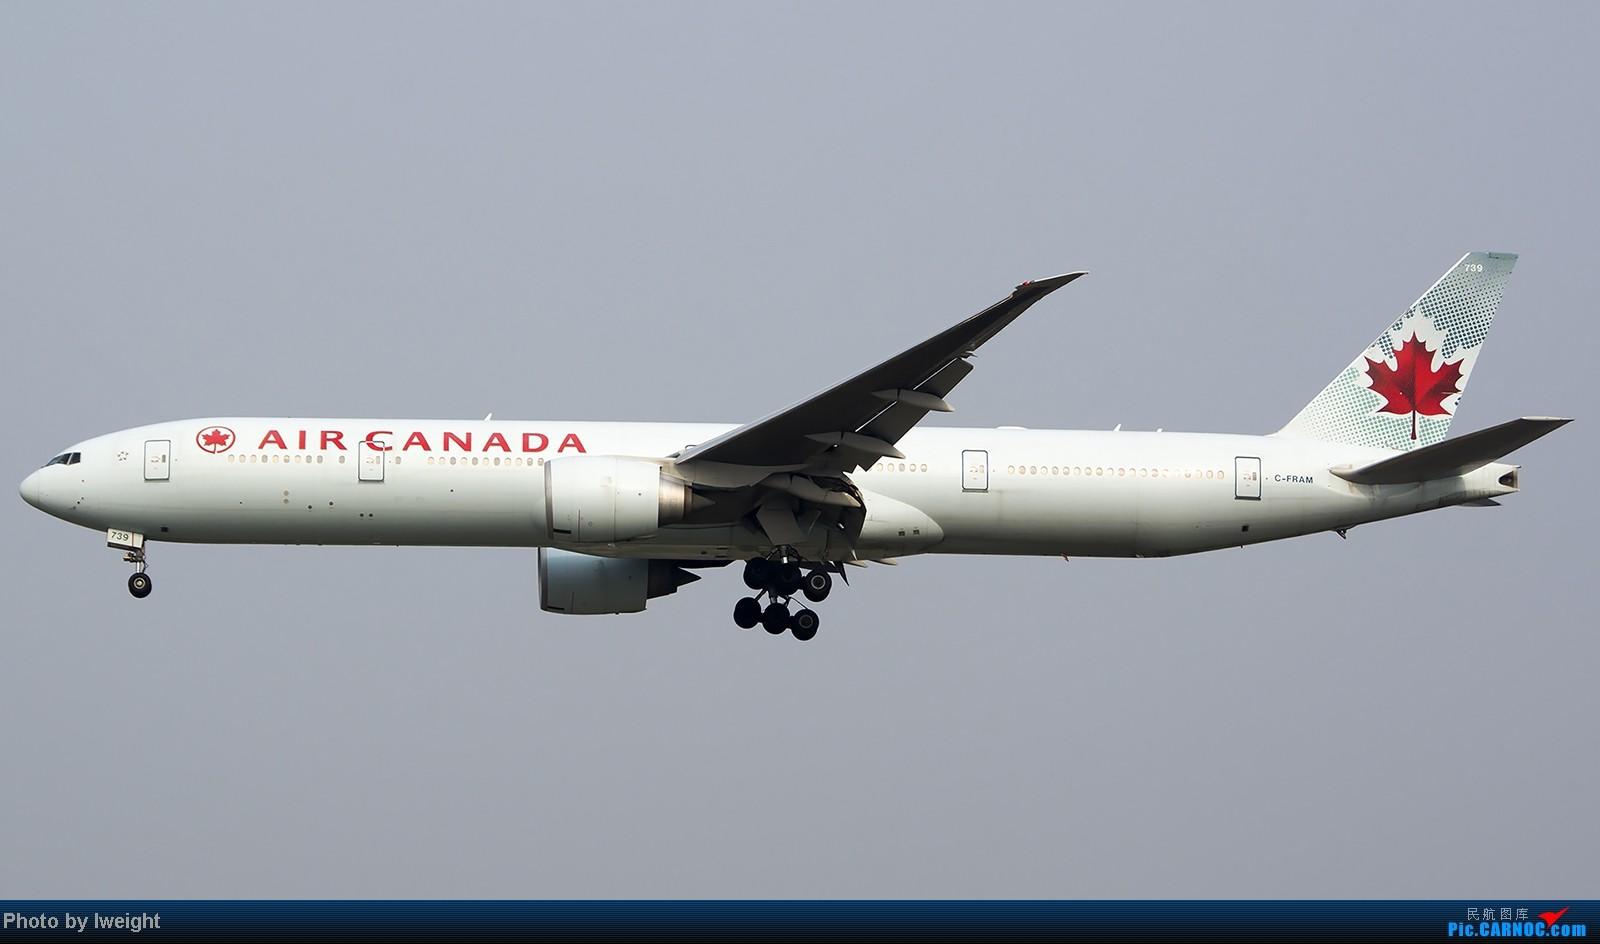 Re:[原创]9月7日帝都的烂天里乱拍一通 BOEING 777-300ER C-FRAM 中国北京首都机场